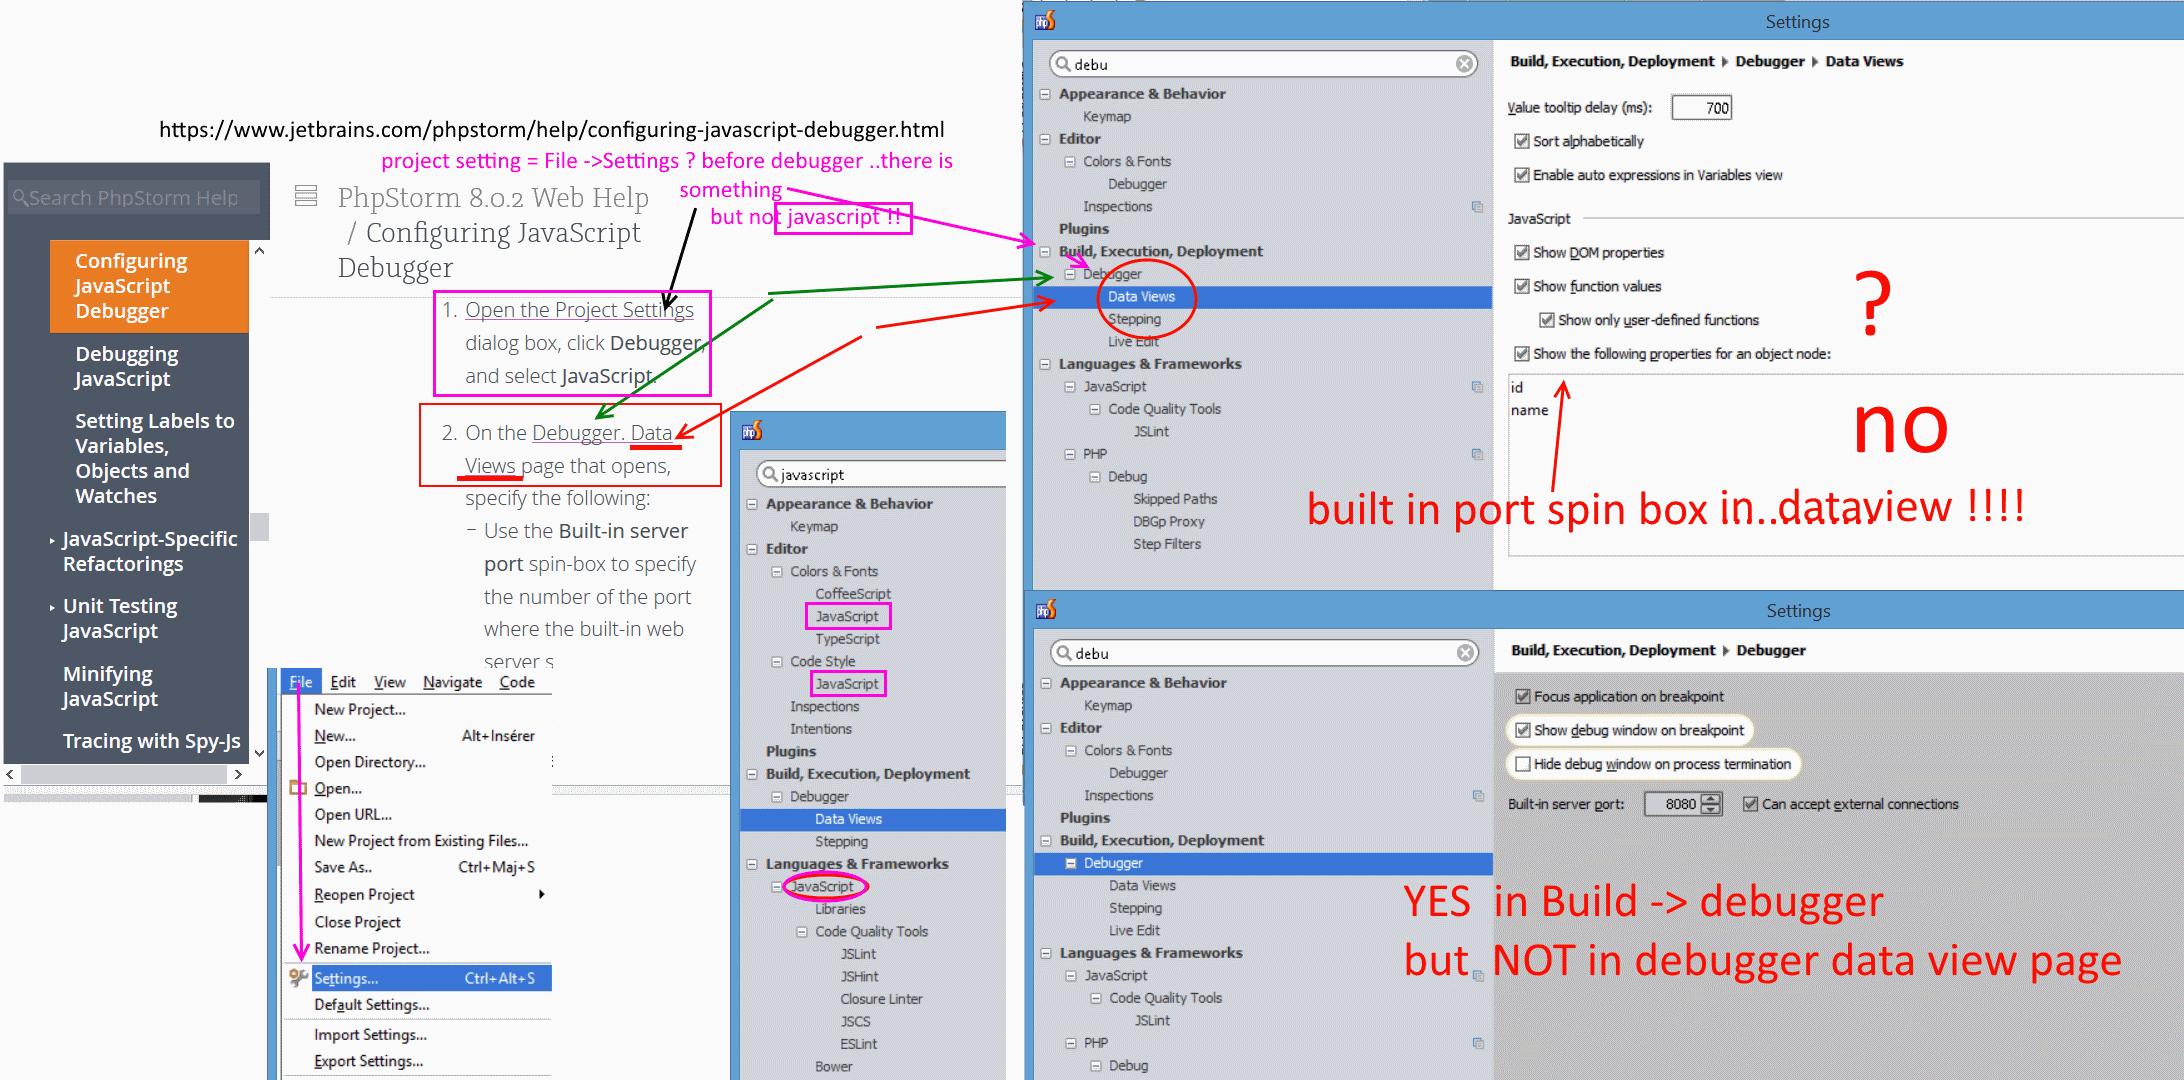 phpstorm_explicitdocumentation.png